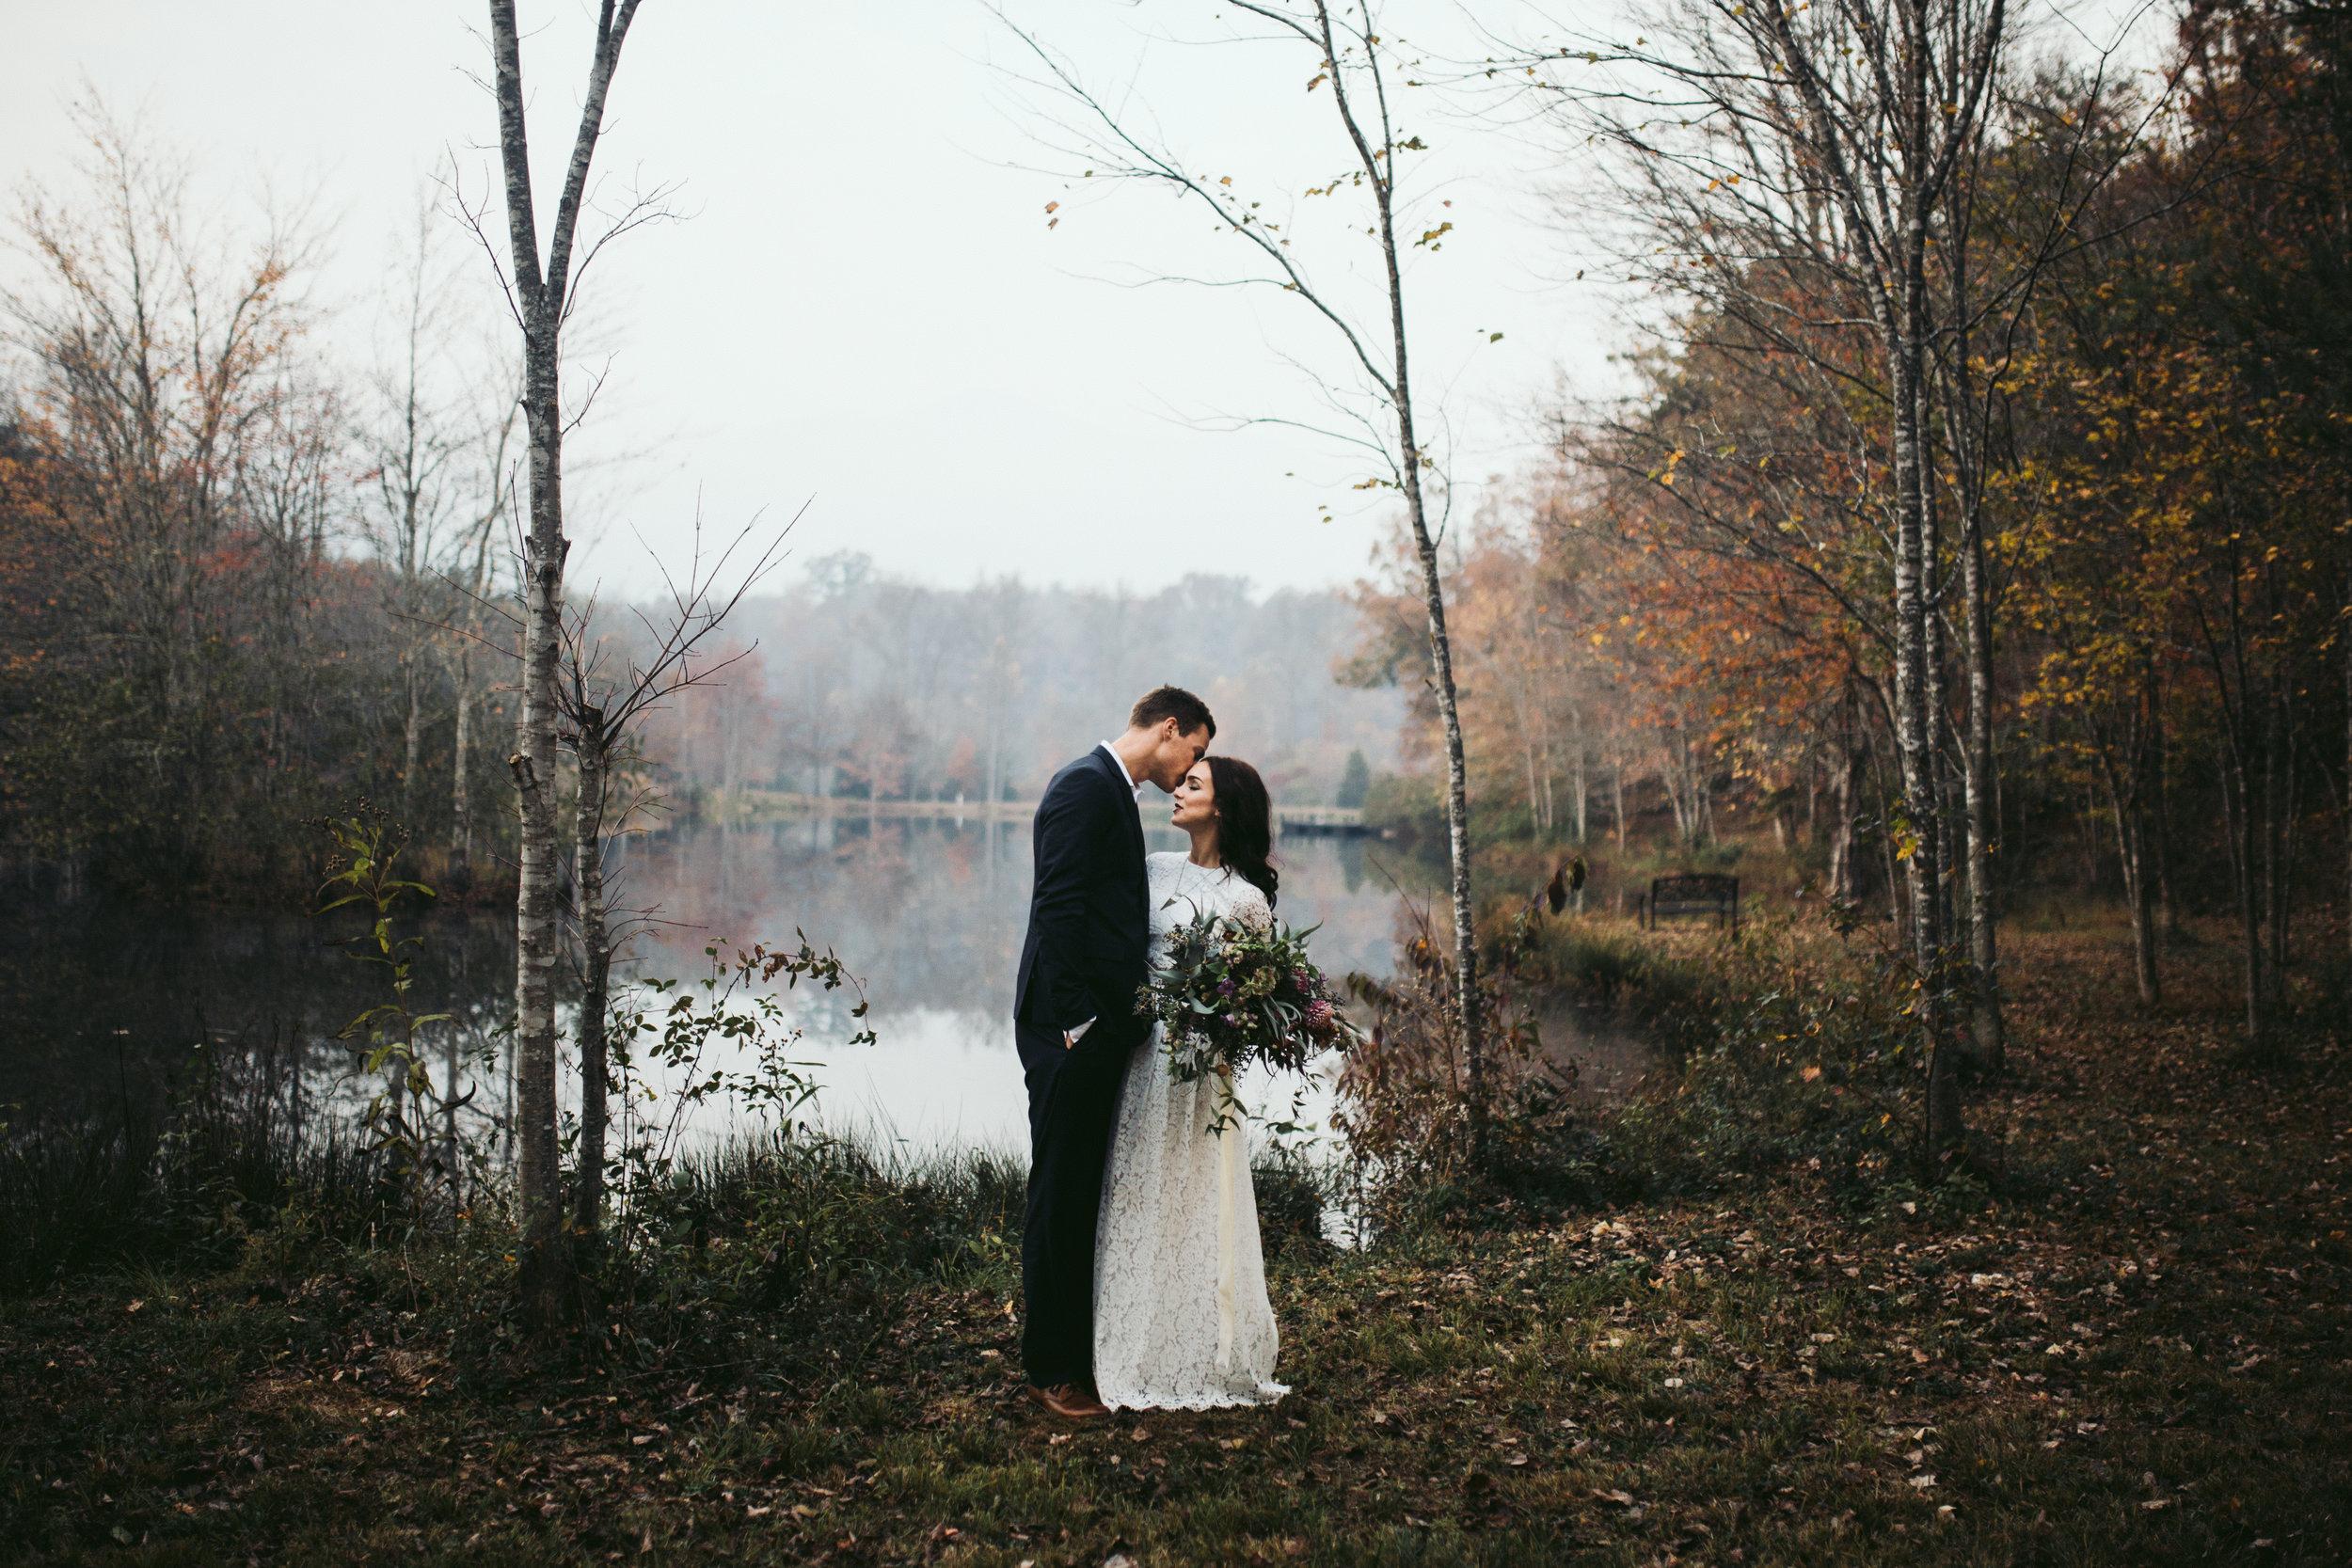 Wedding Packages : beginnning at $1,300